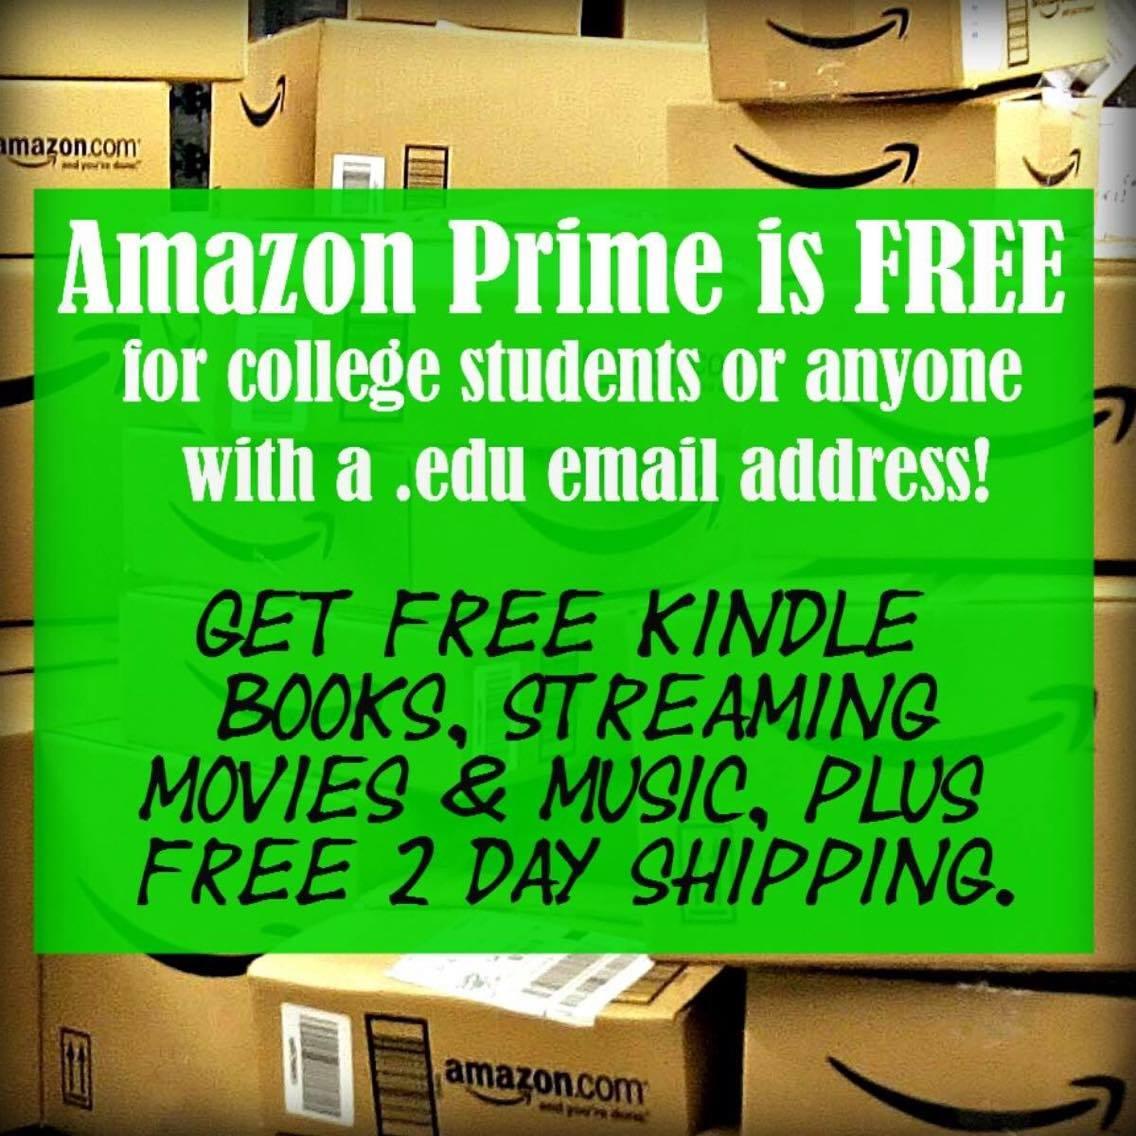 amazon-prime-college